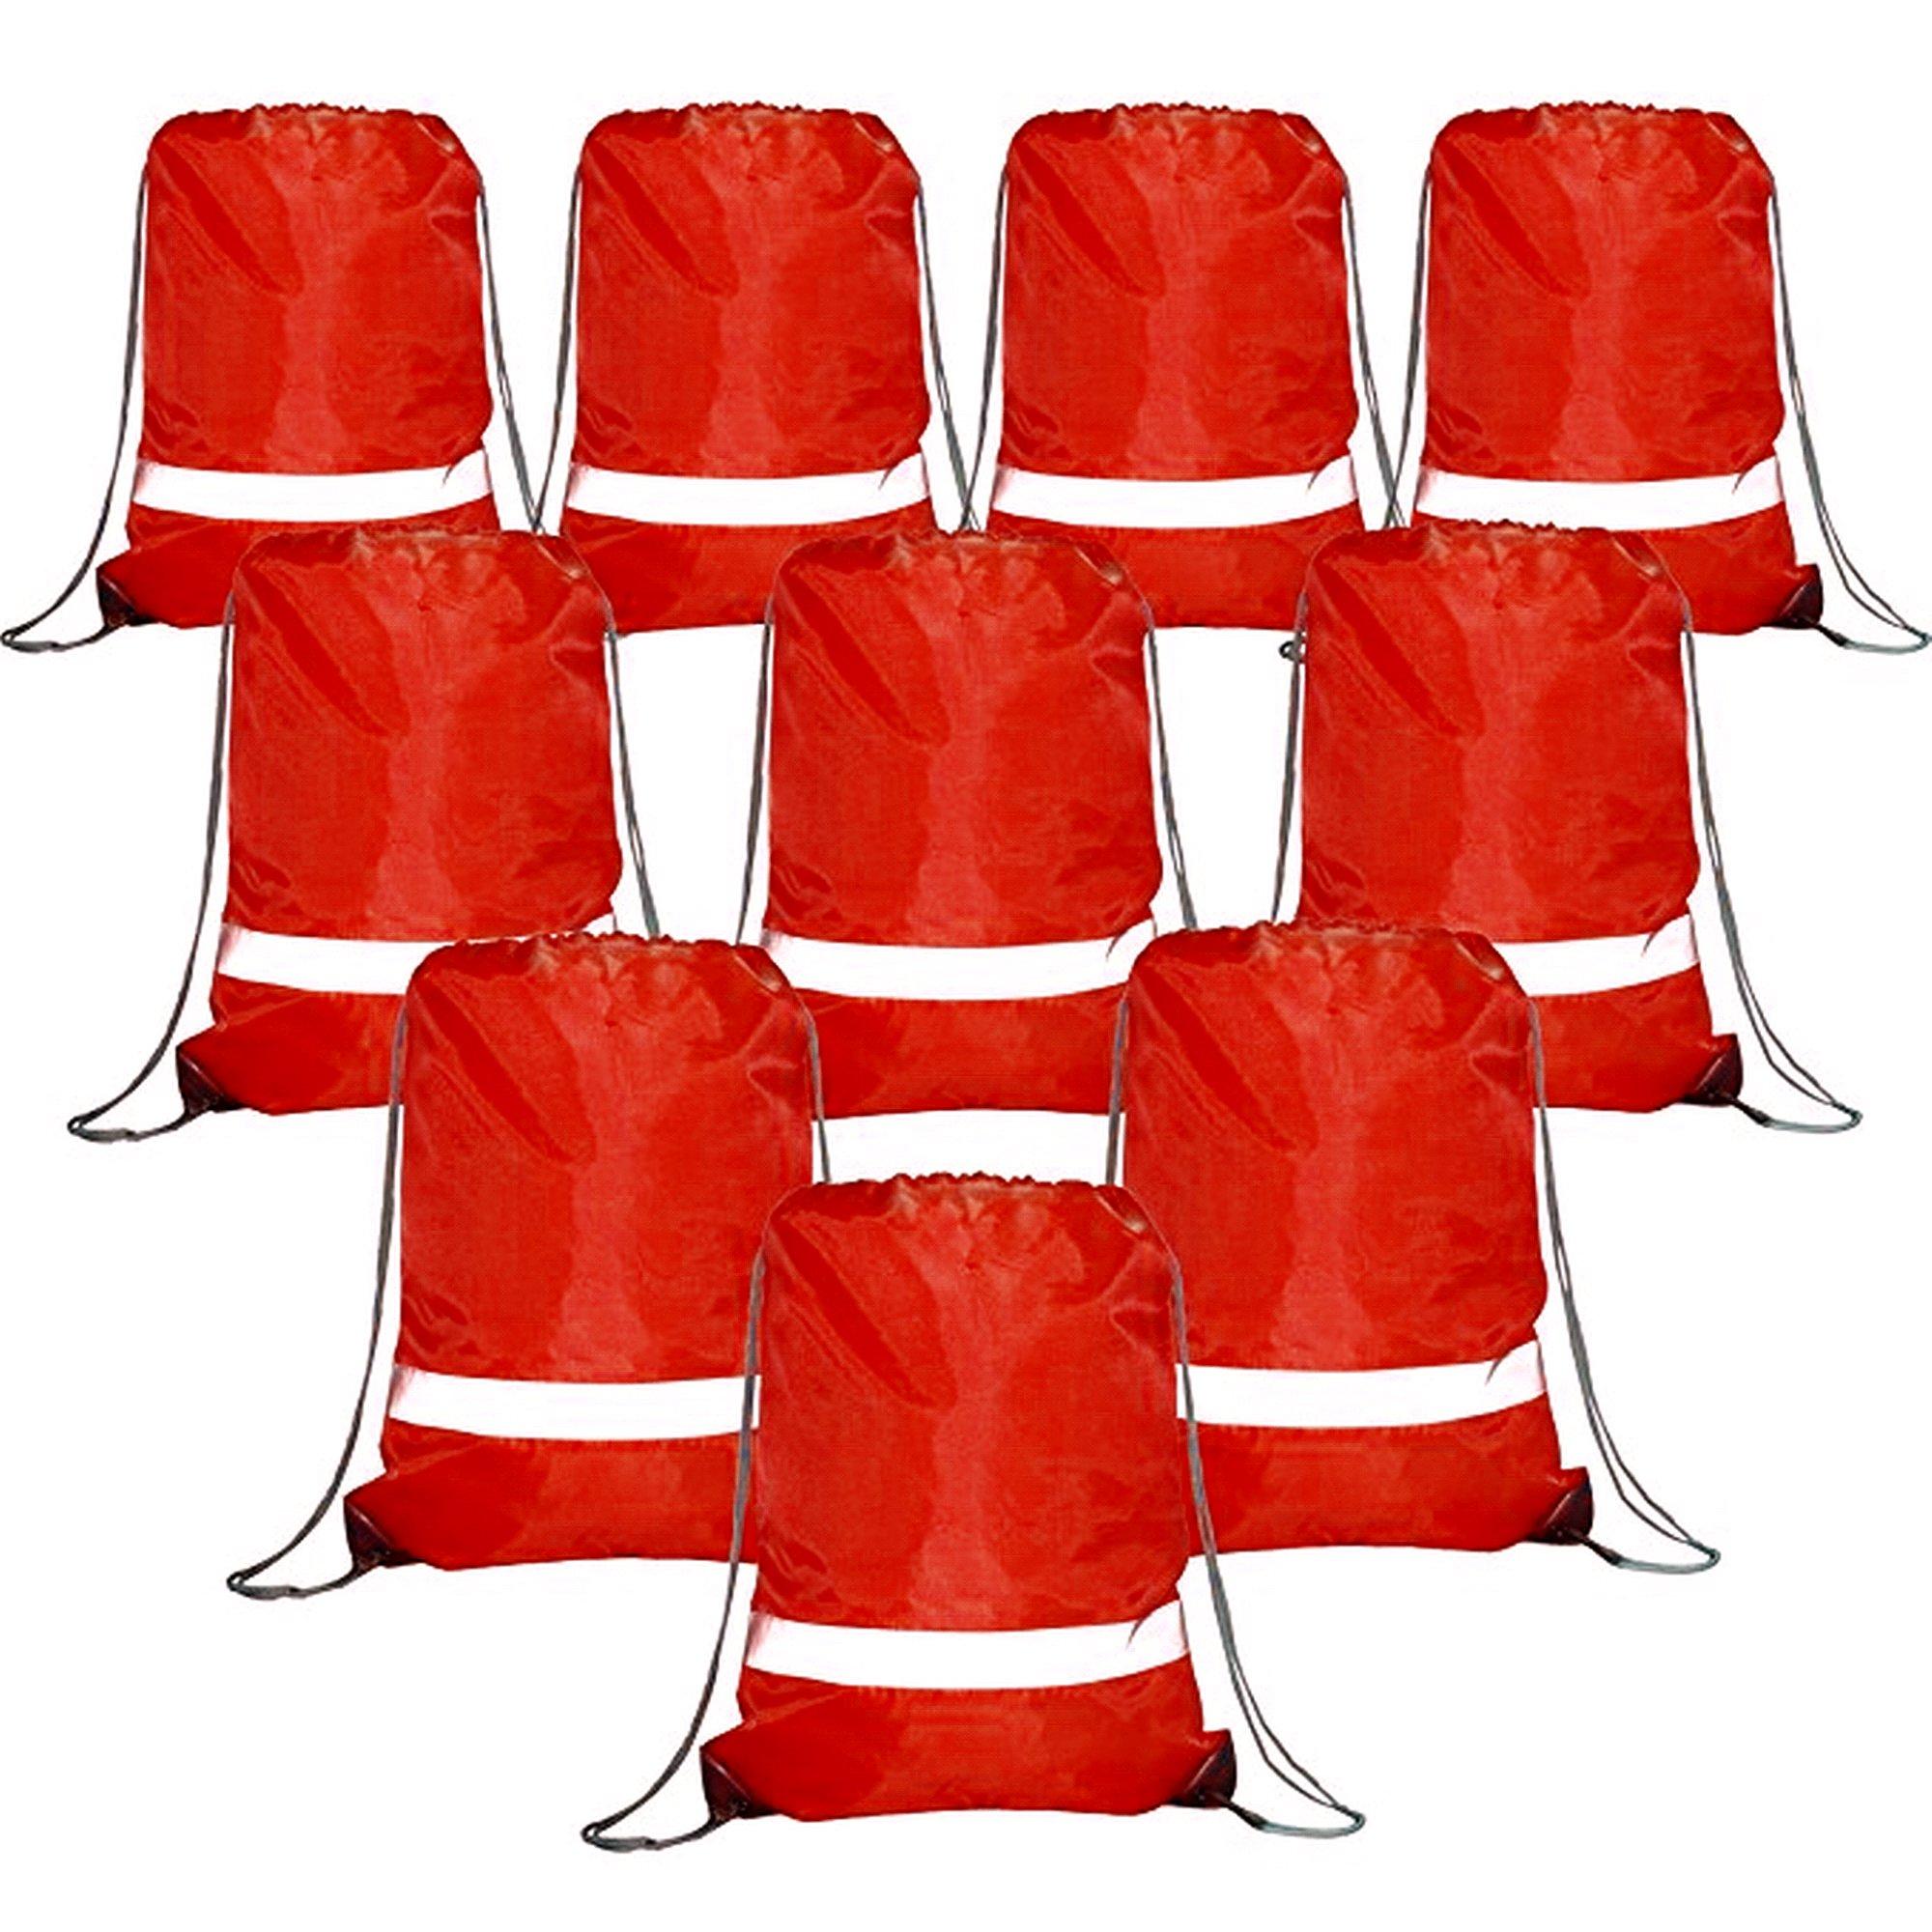 Drawstring Backpack Bags Reflective 10 Pack, Promotional Sport Gym Sack Cinch Bag (Red)